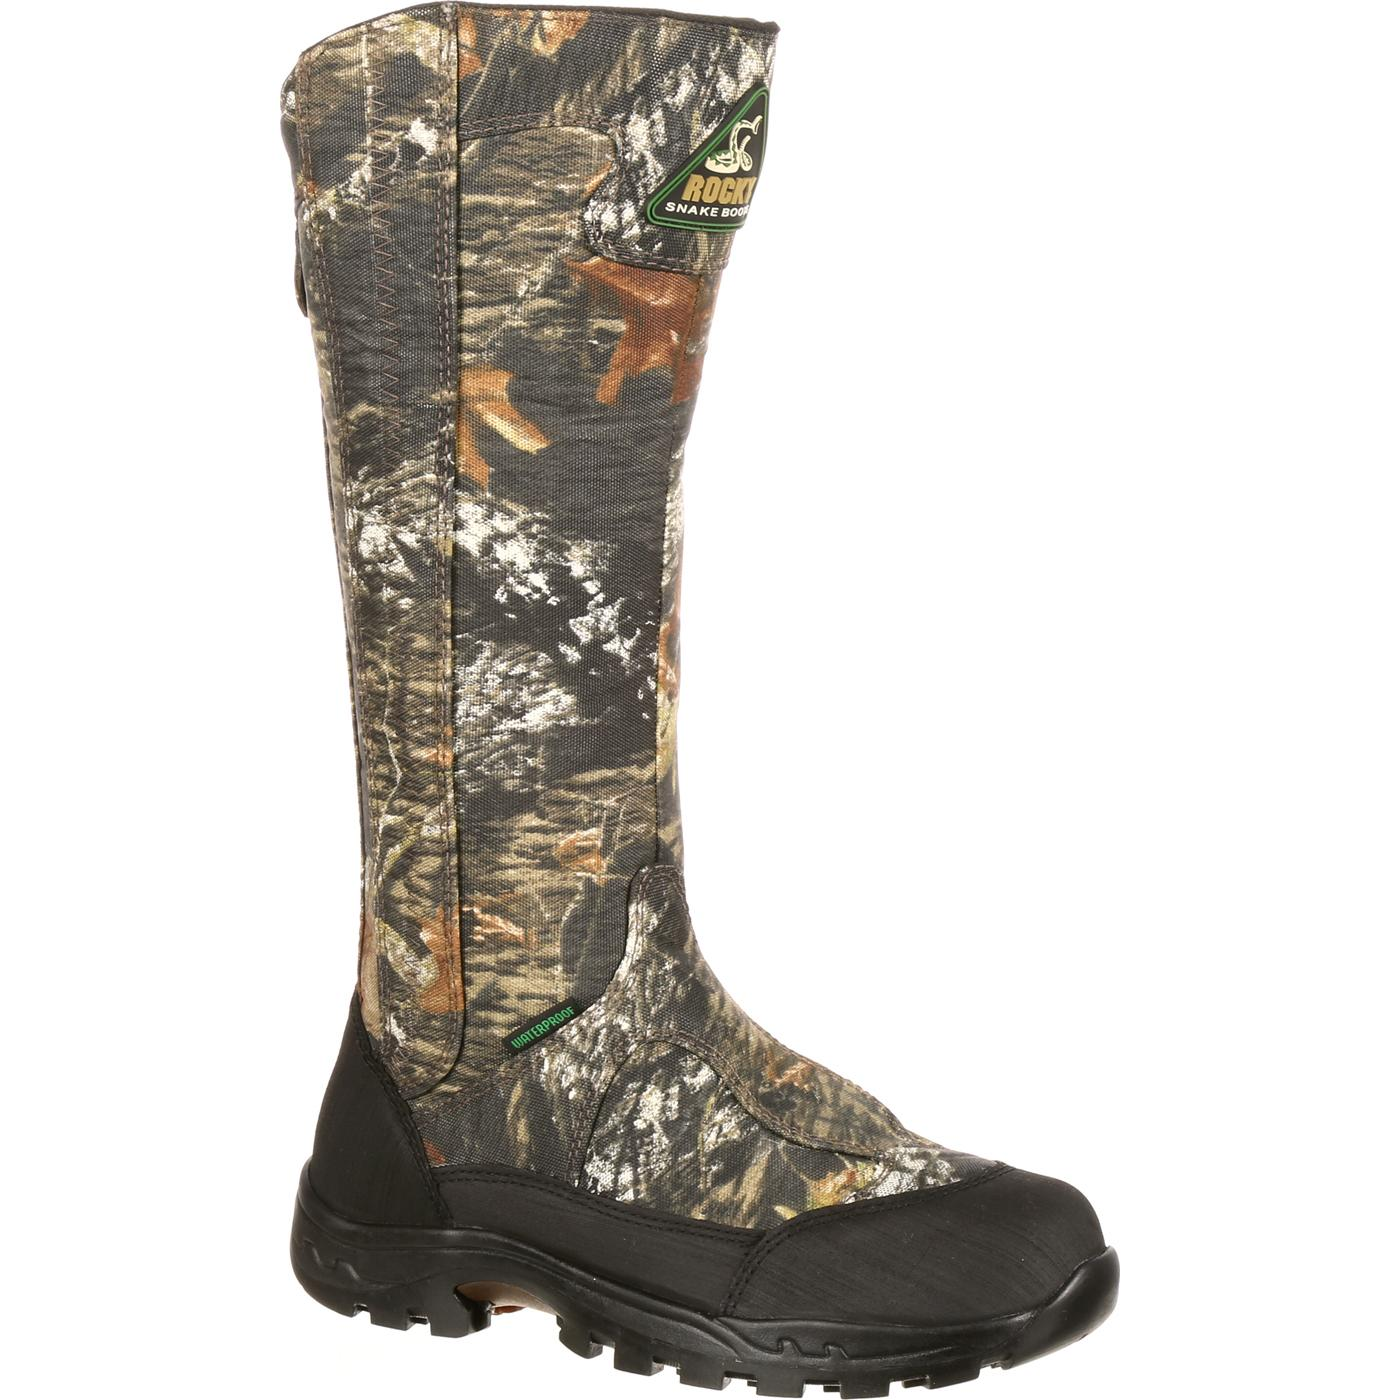 de6bc96b467 Rocky ProLight Waterproof Snakeproof Boot